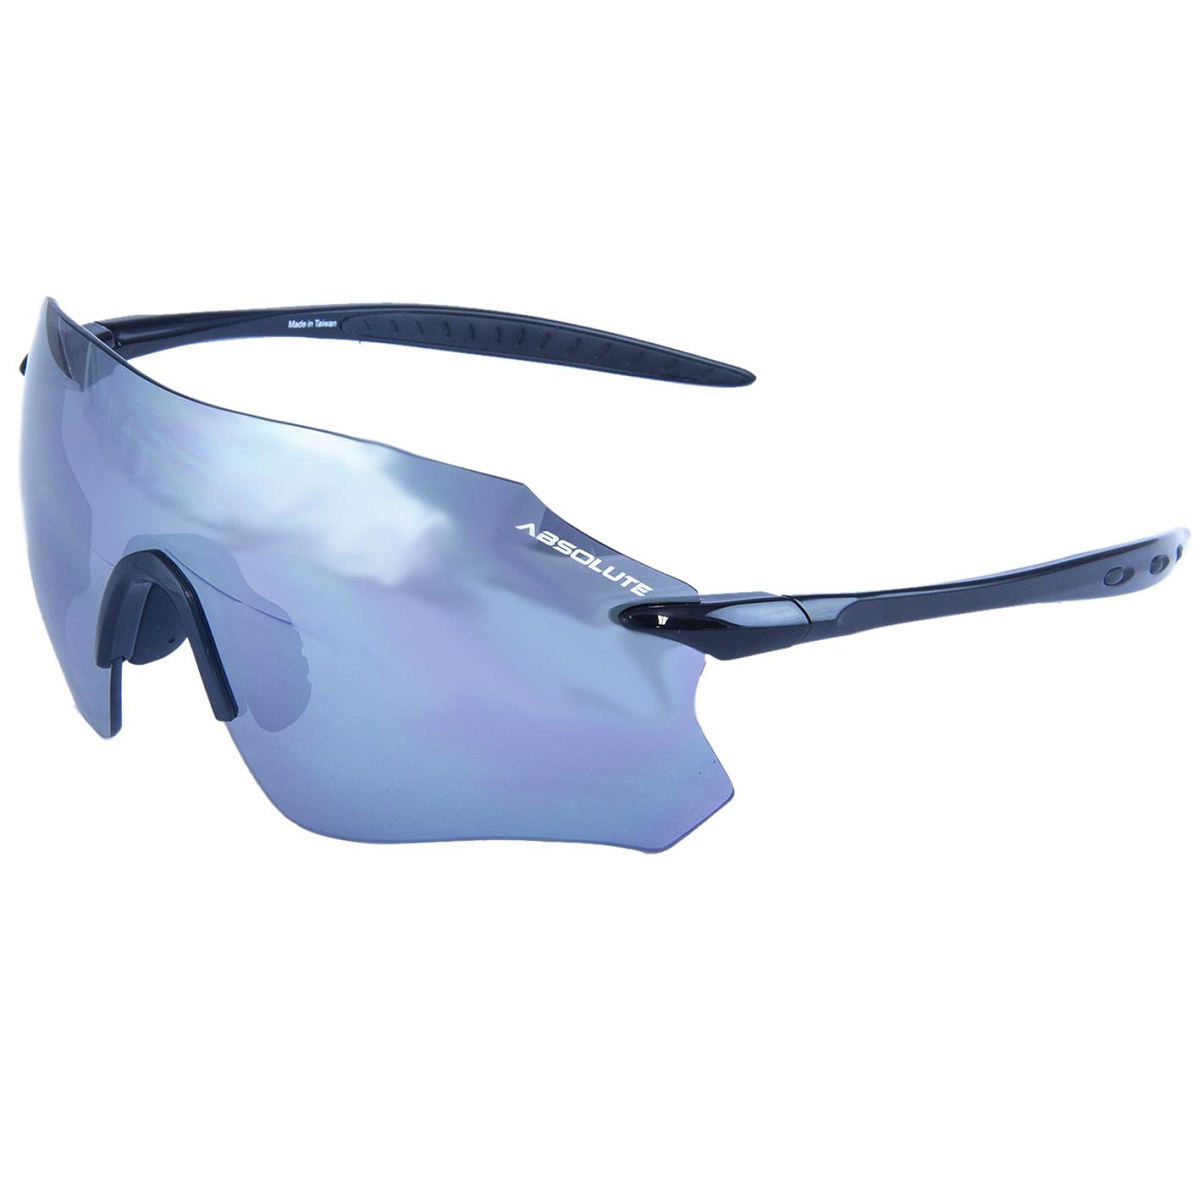 Oculos Absolute Prime Sl Pto., Lente Preta.